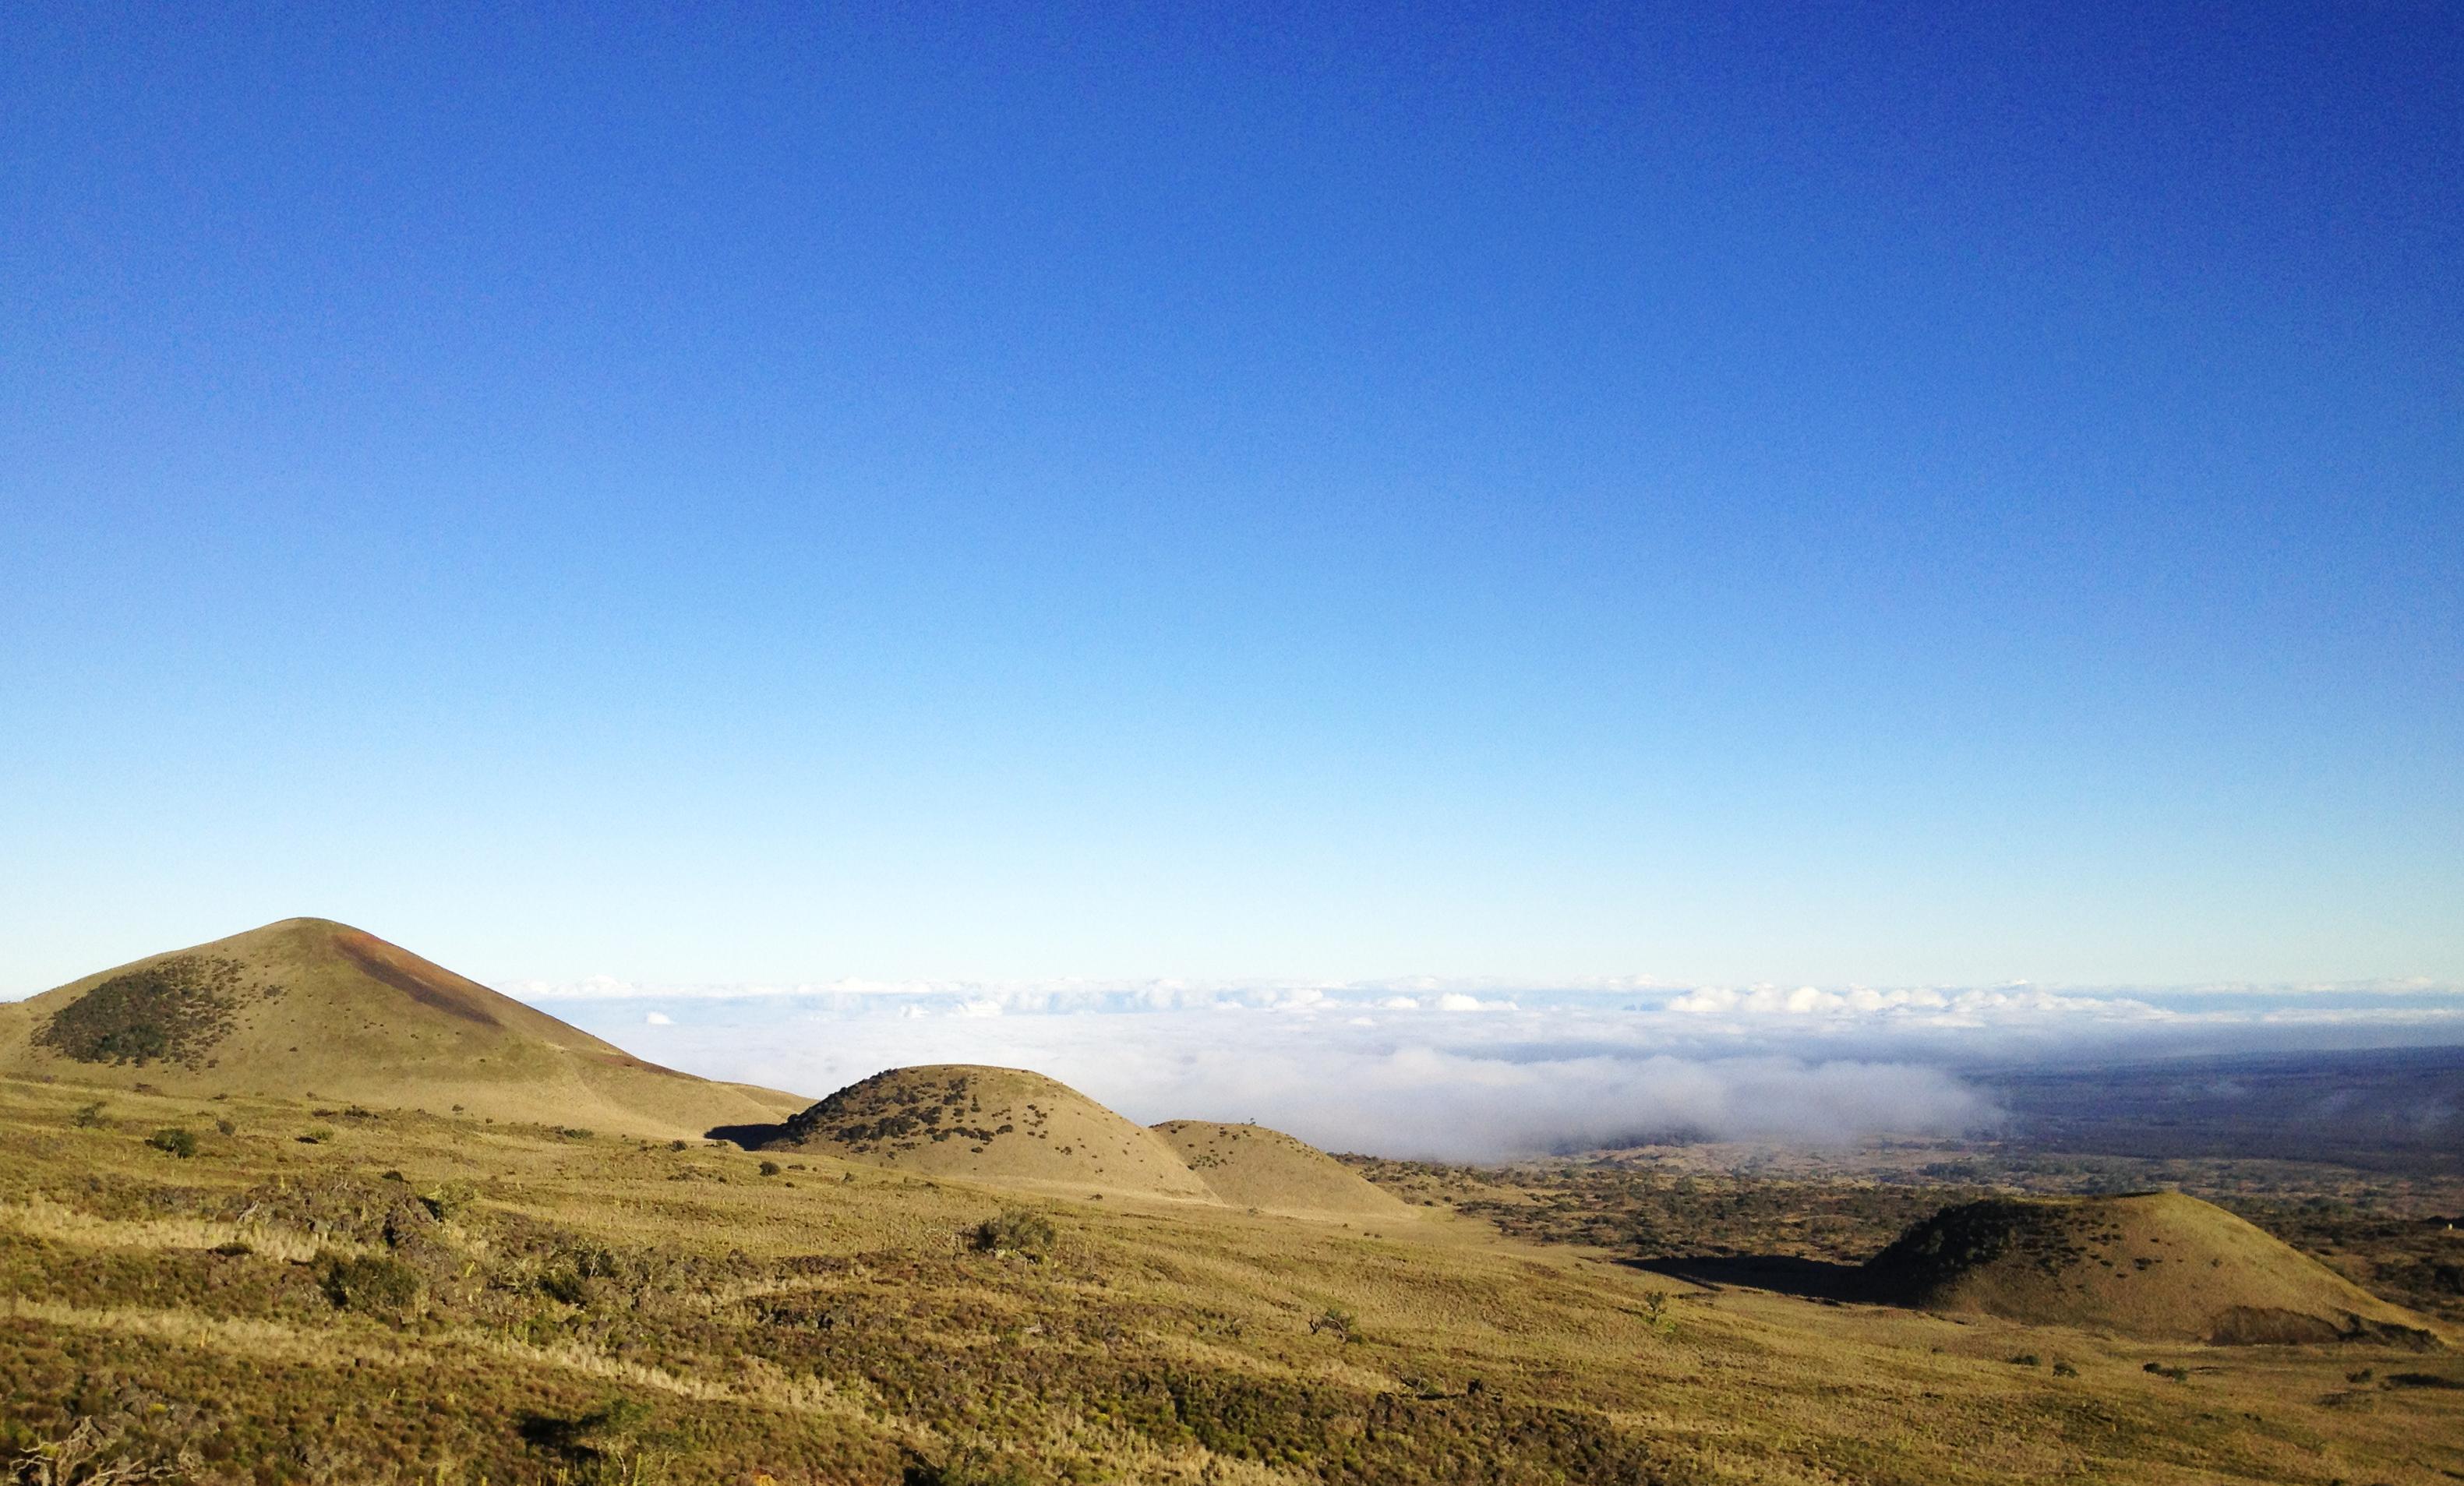 Cinder cones on the flank of Mauna Kea